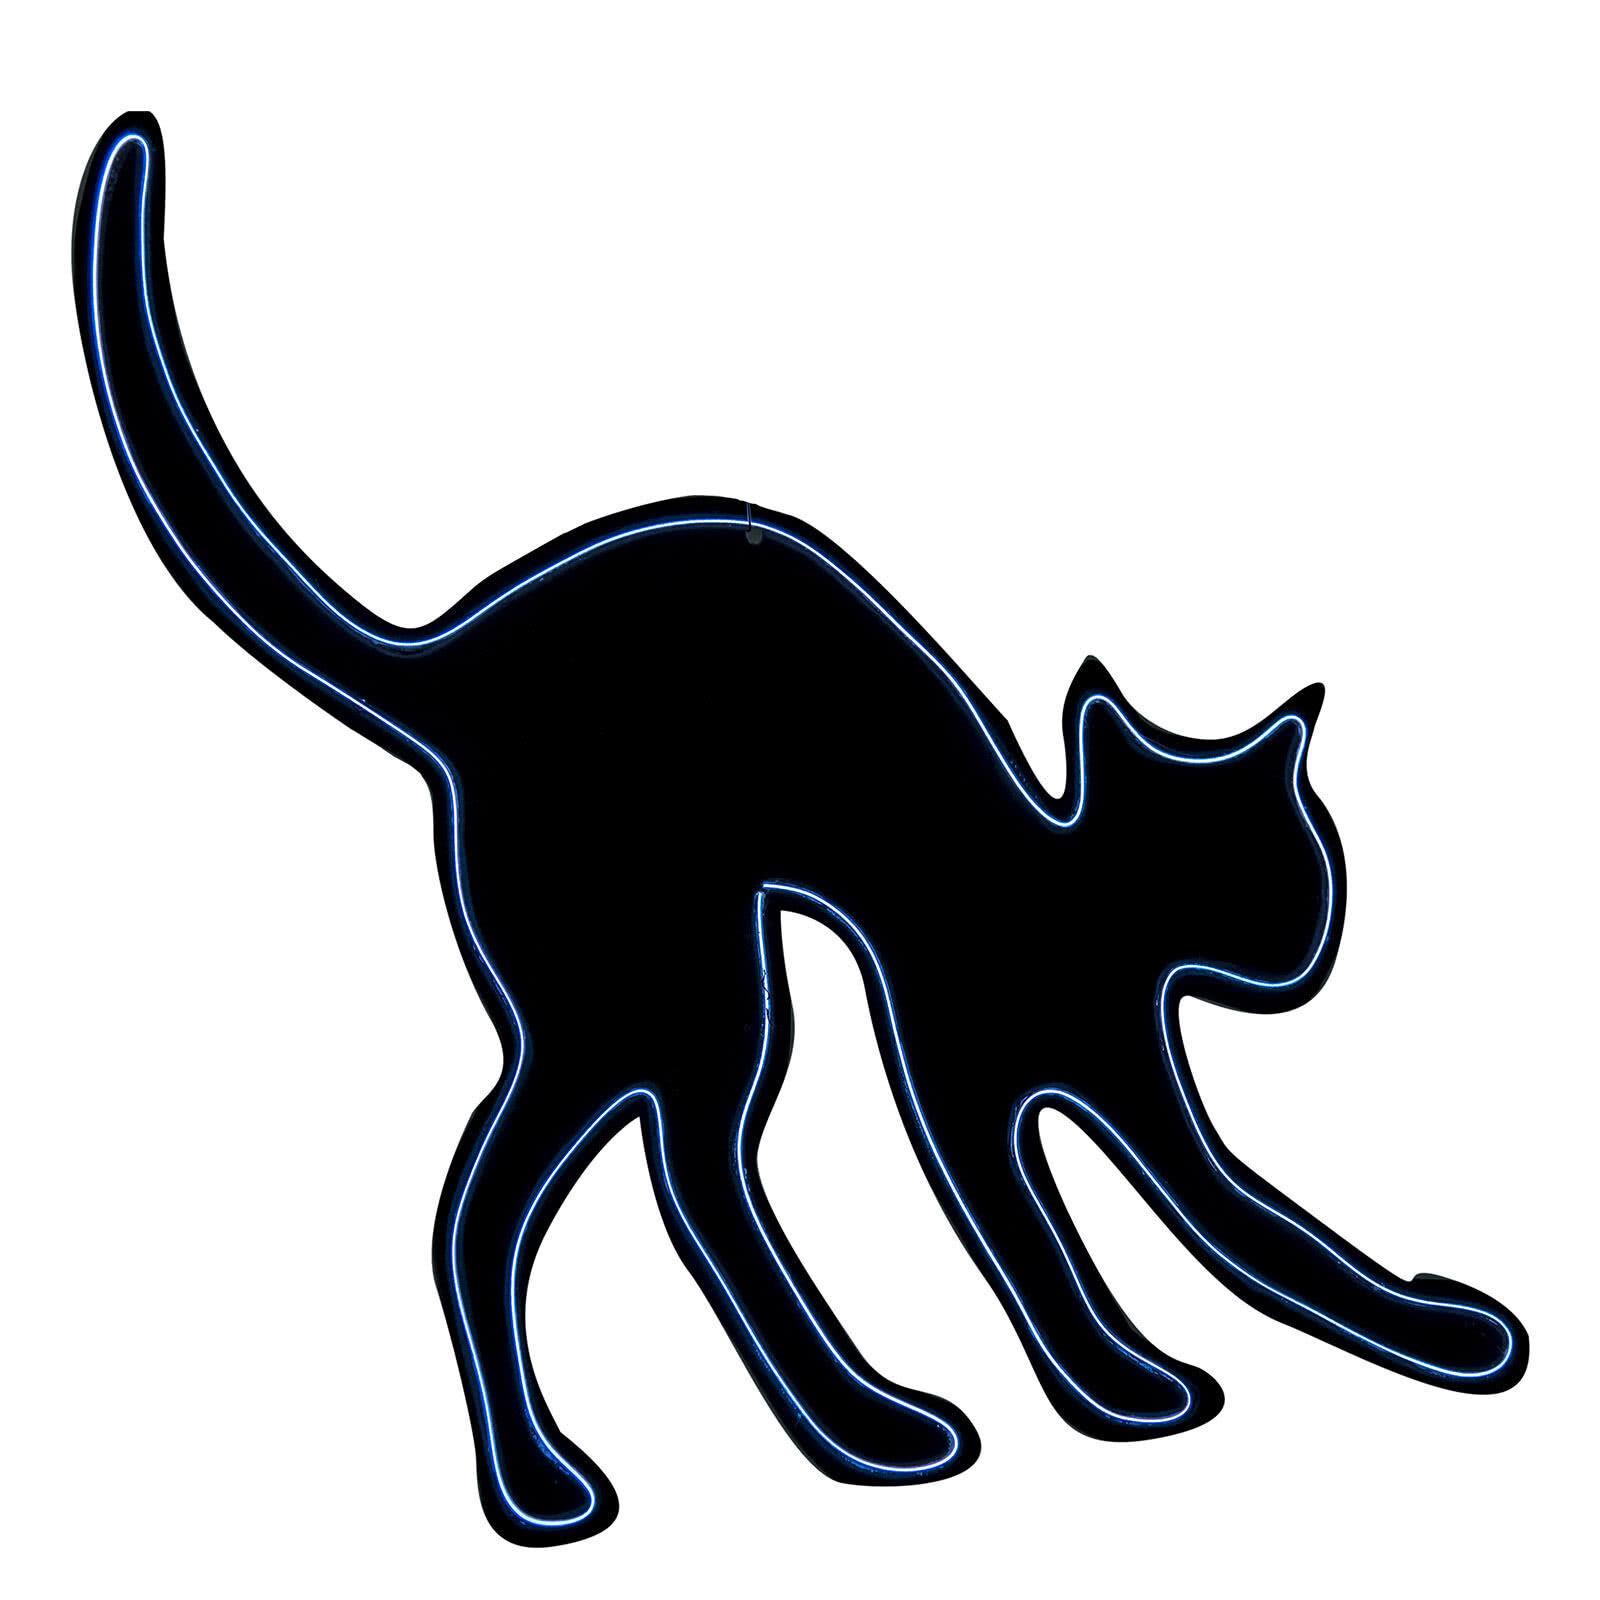 LOLA home Gato de pared de Halloween negro de goma eva de 44x36 cm